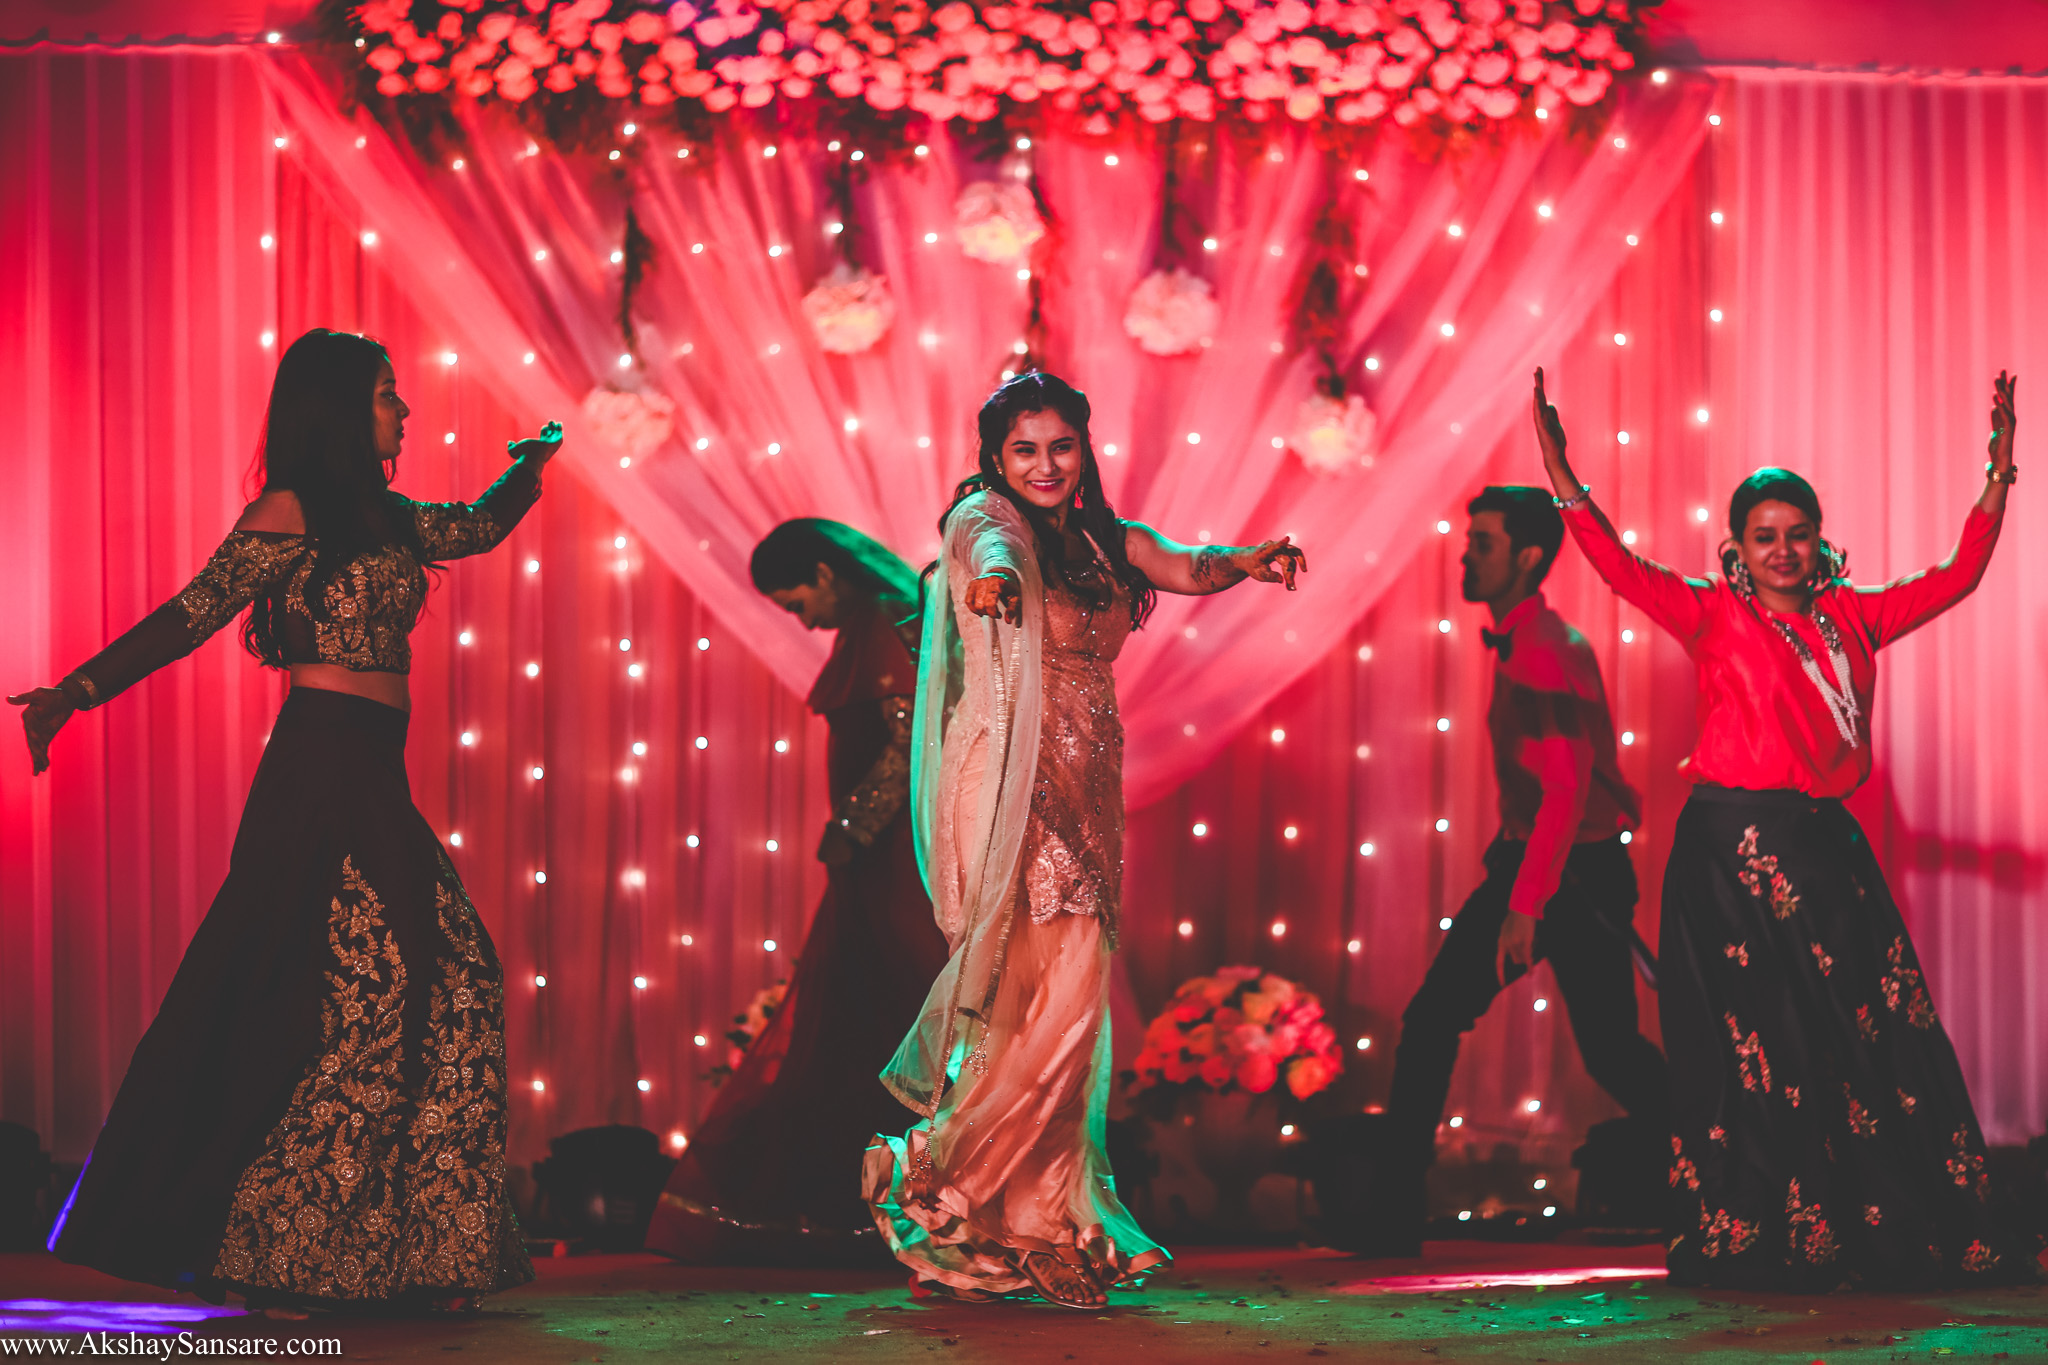 Akshay Sansare Photography Kunal x Shrutika best candid photographers in mumbai(17).jpg